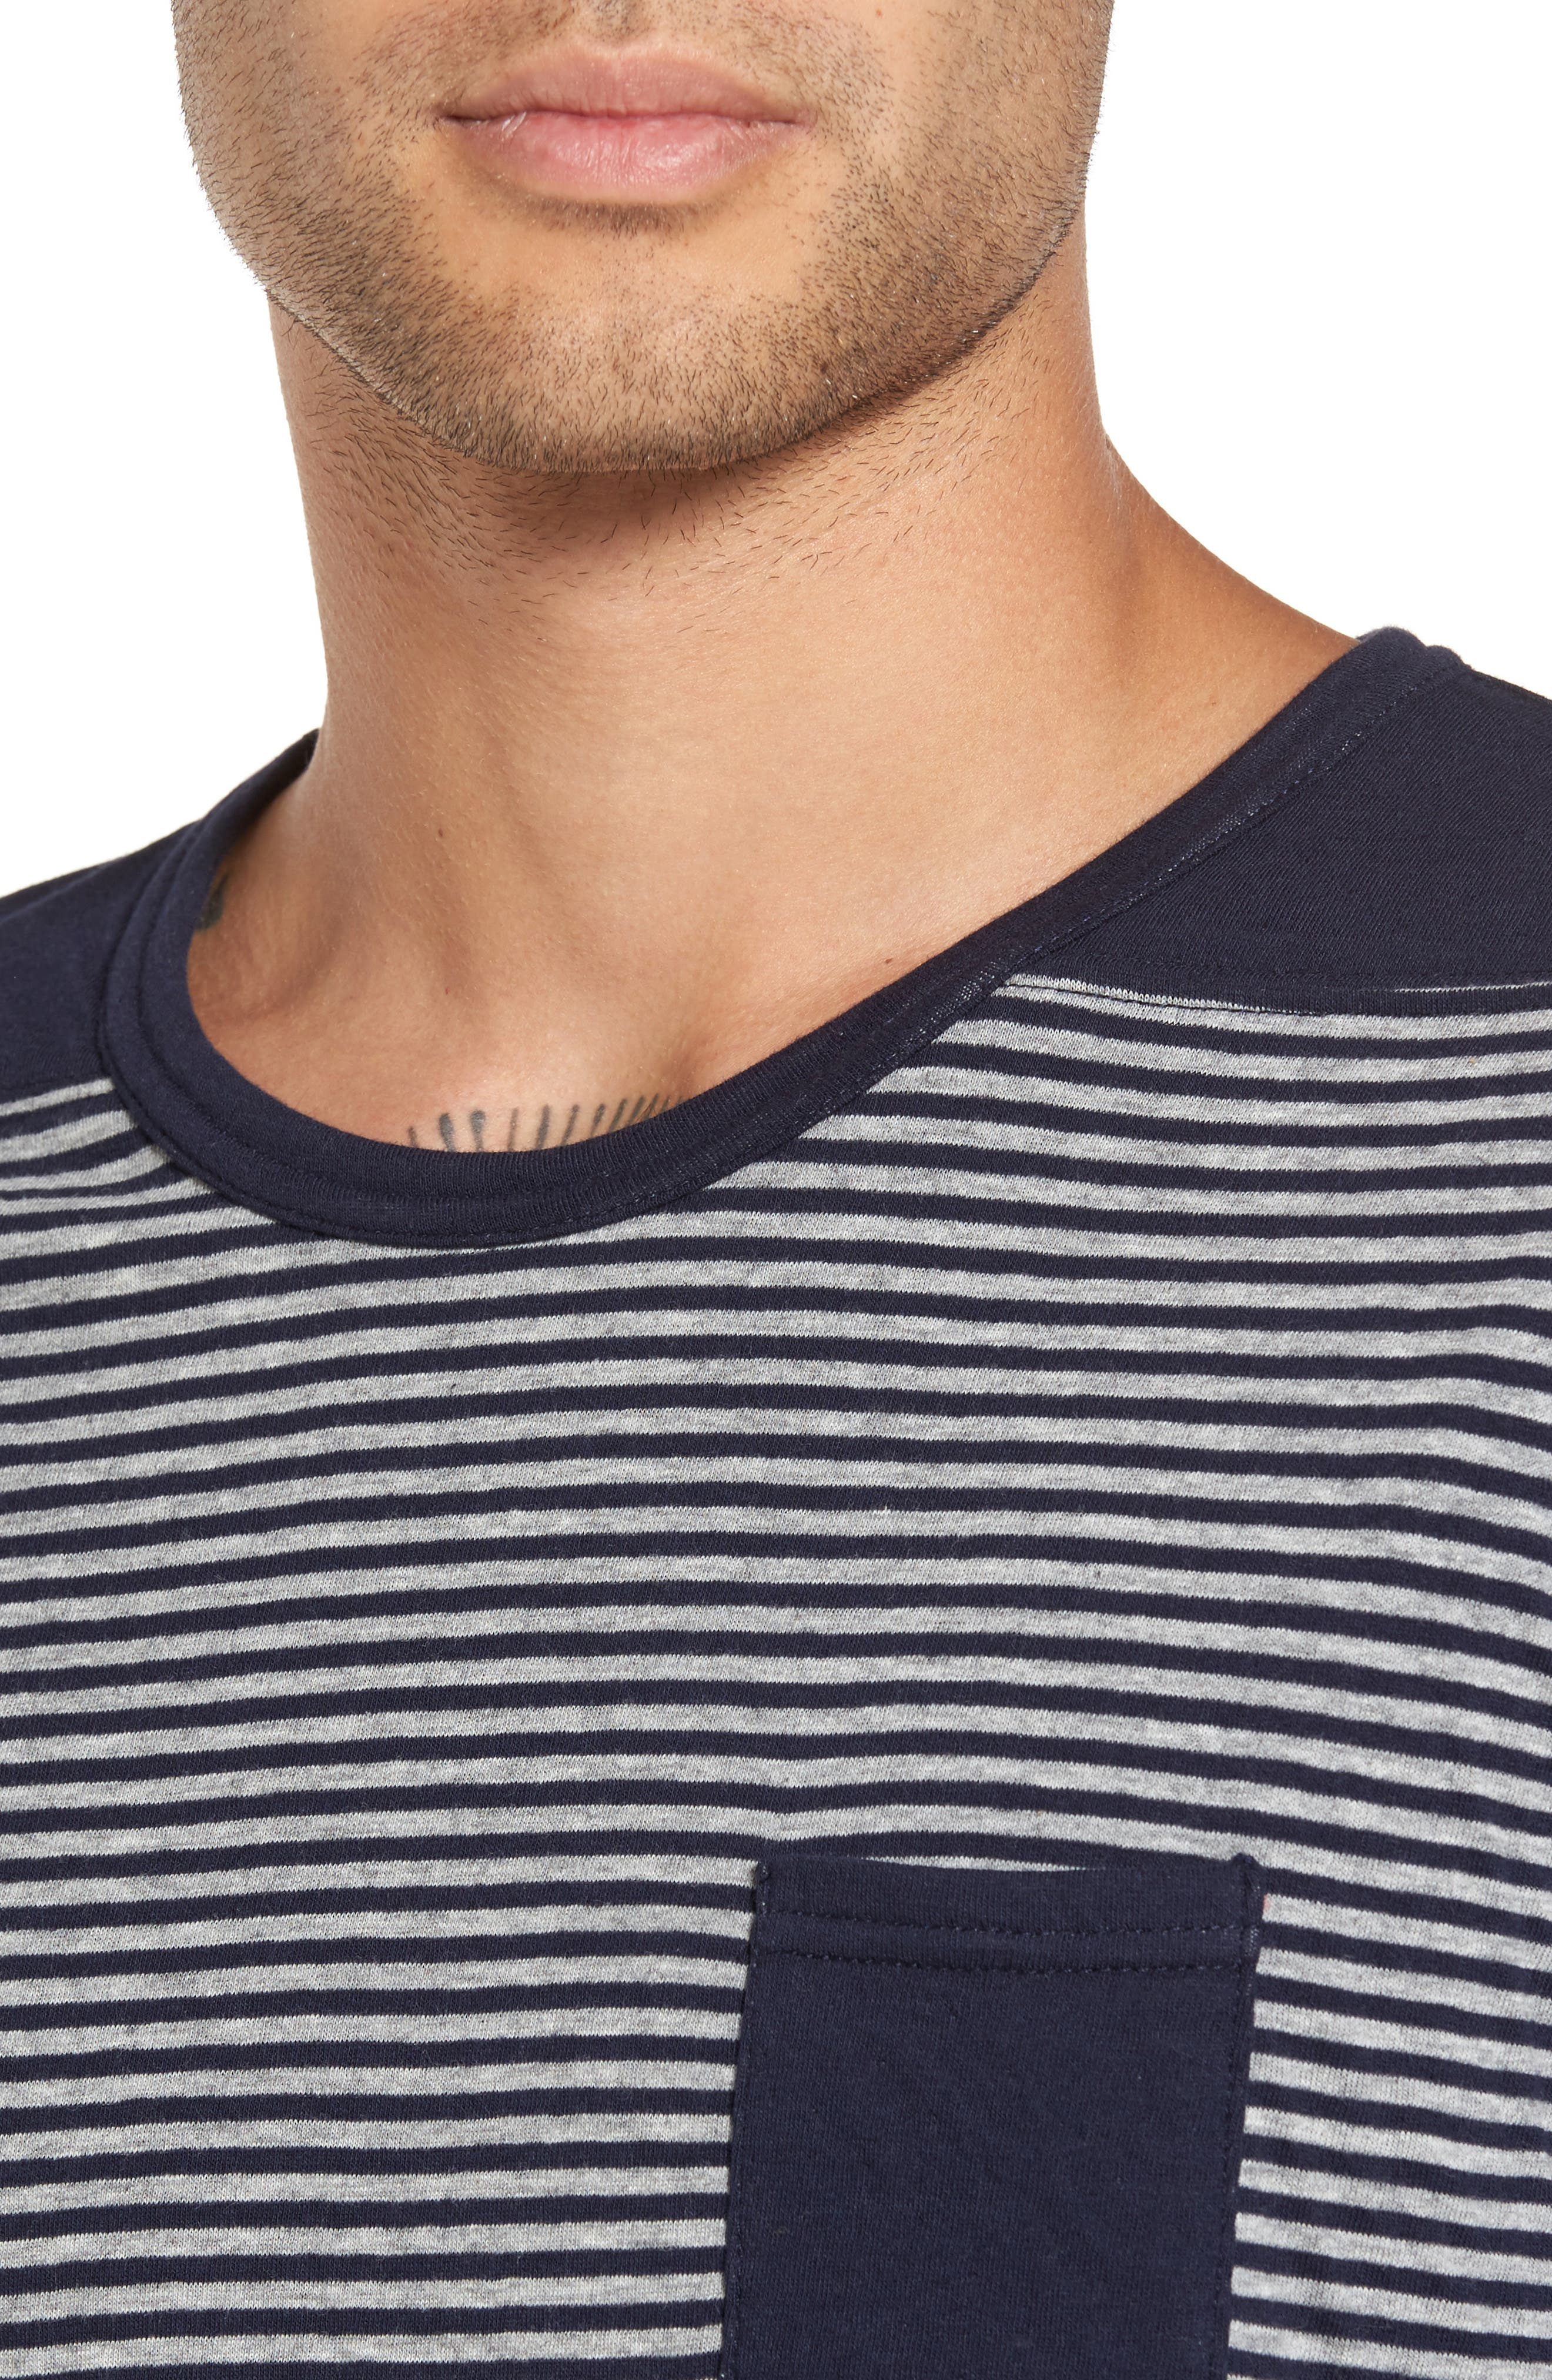 Striped Pocket T-Shirt,                             Alternate thumbnail 4, color,                             Navy/ White Stripe